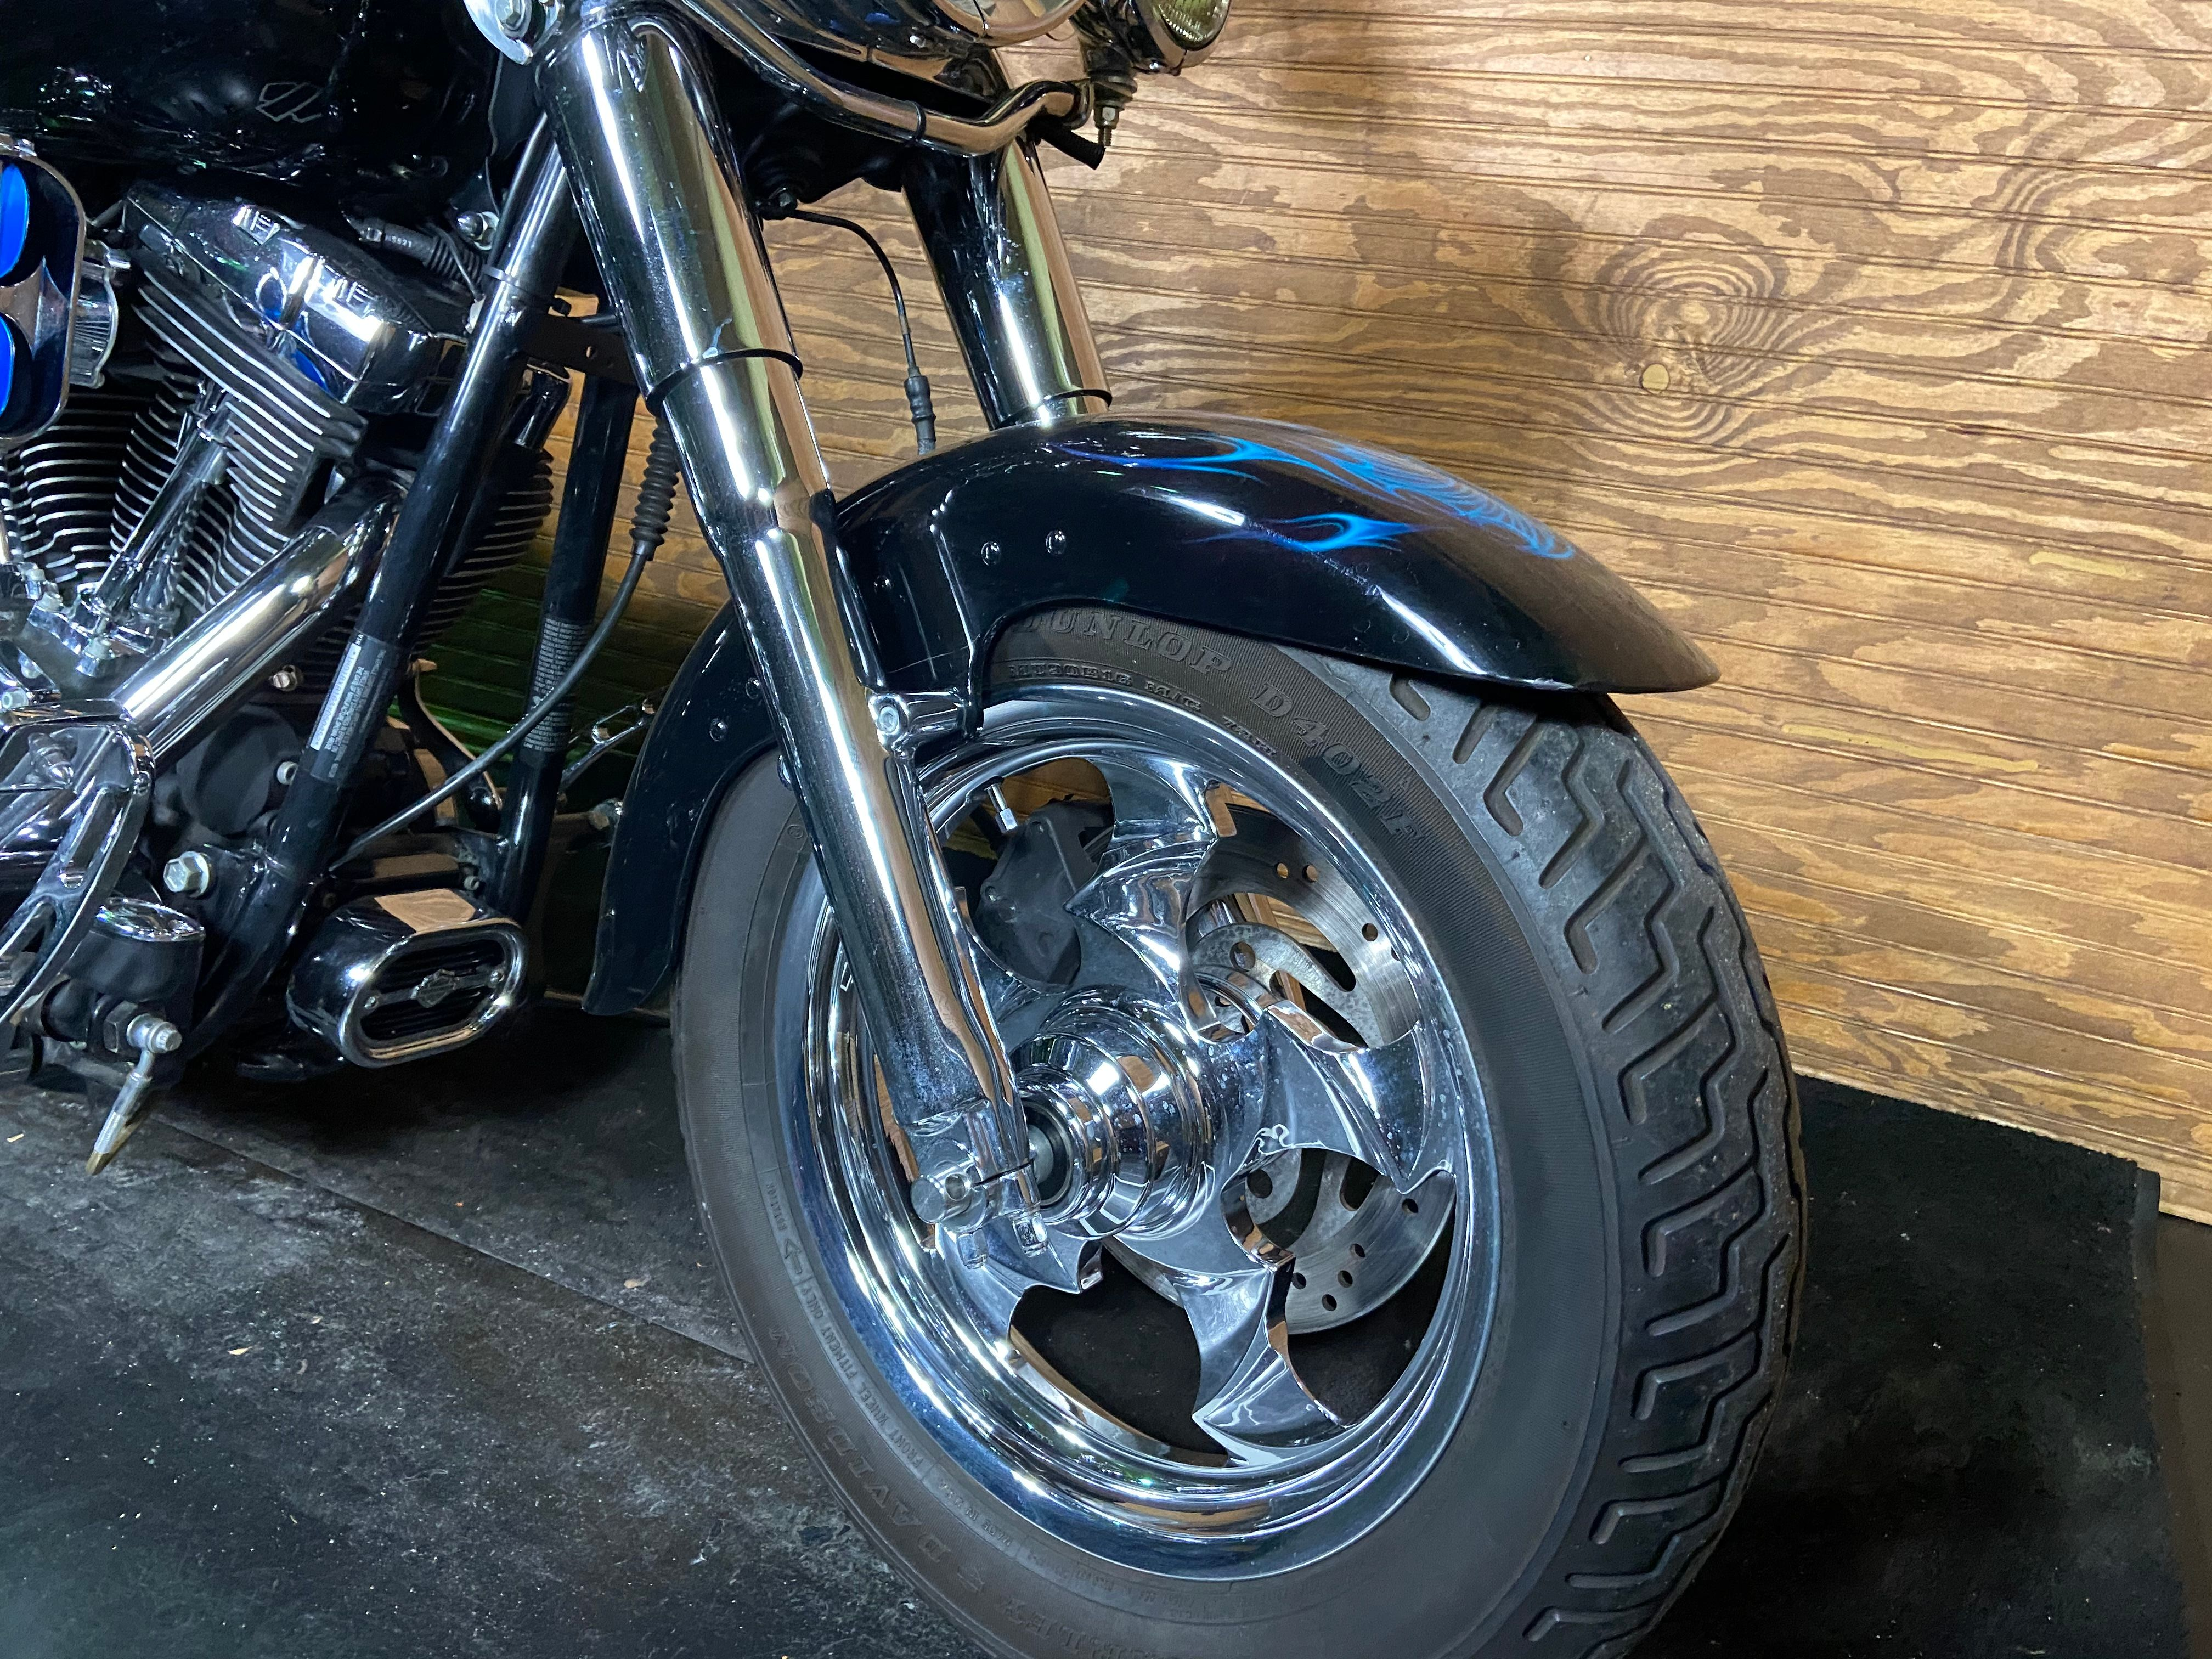 Pre-Owned 2003 Harley-Davidson Fat Boy